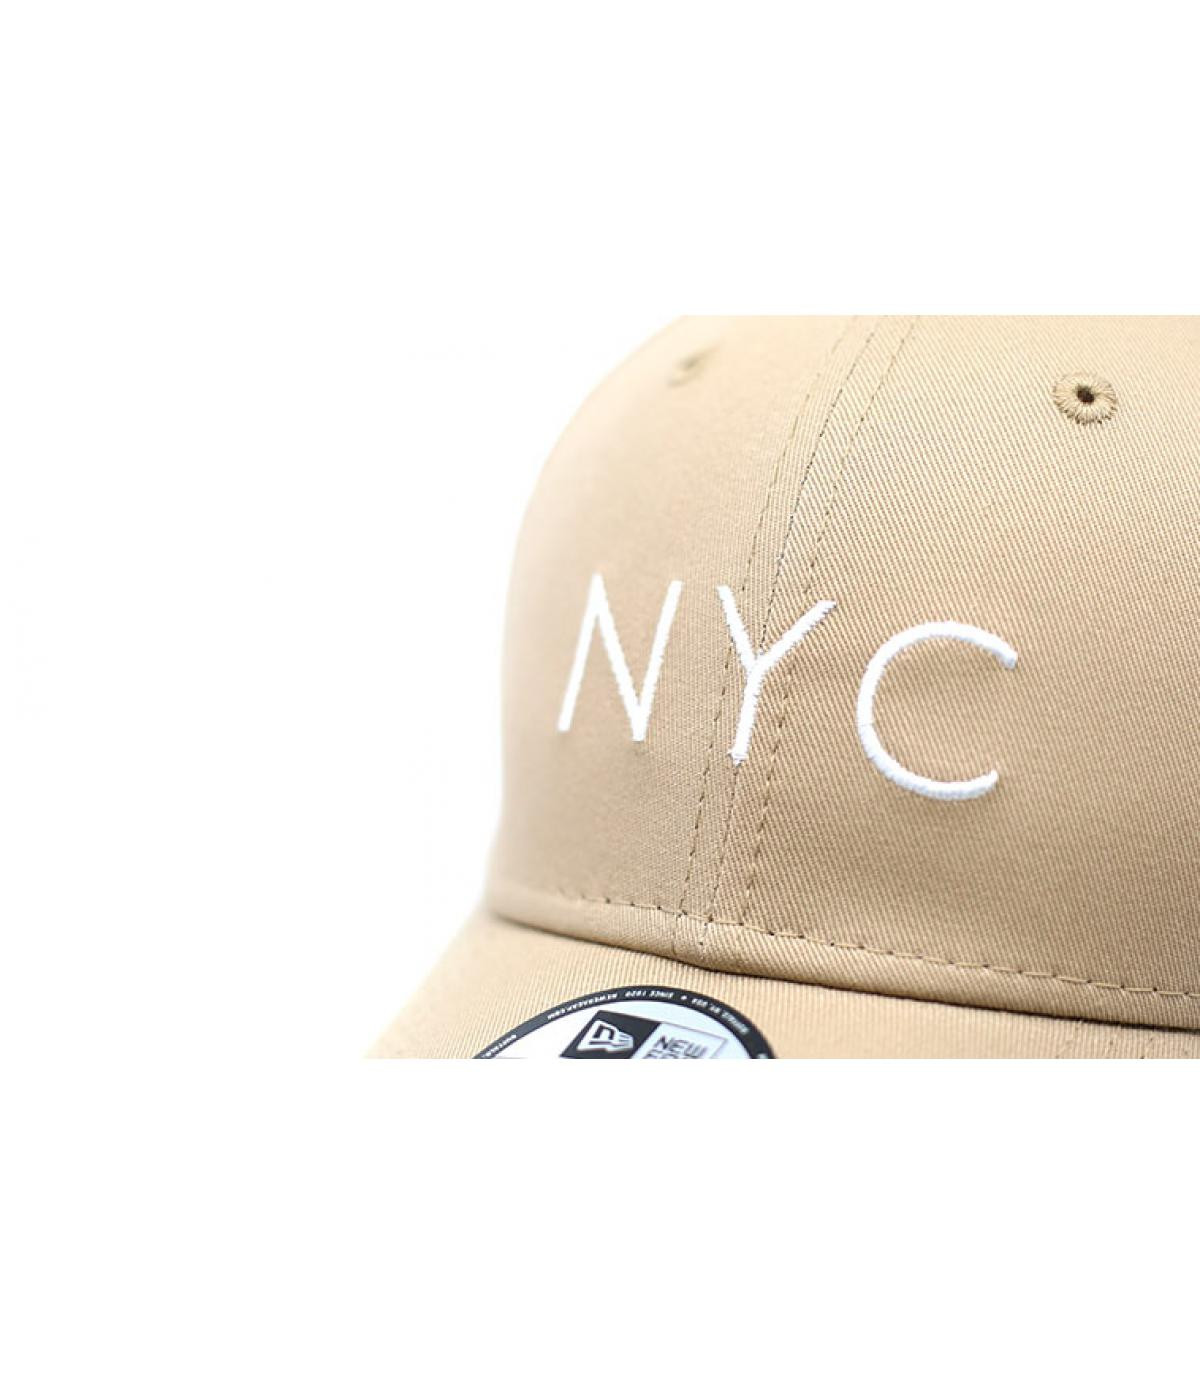 Détails NYC NE Ess 9Forty camel - image 3